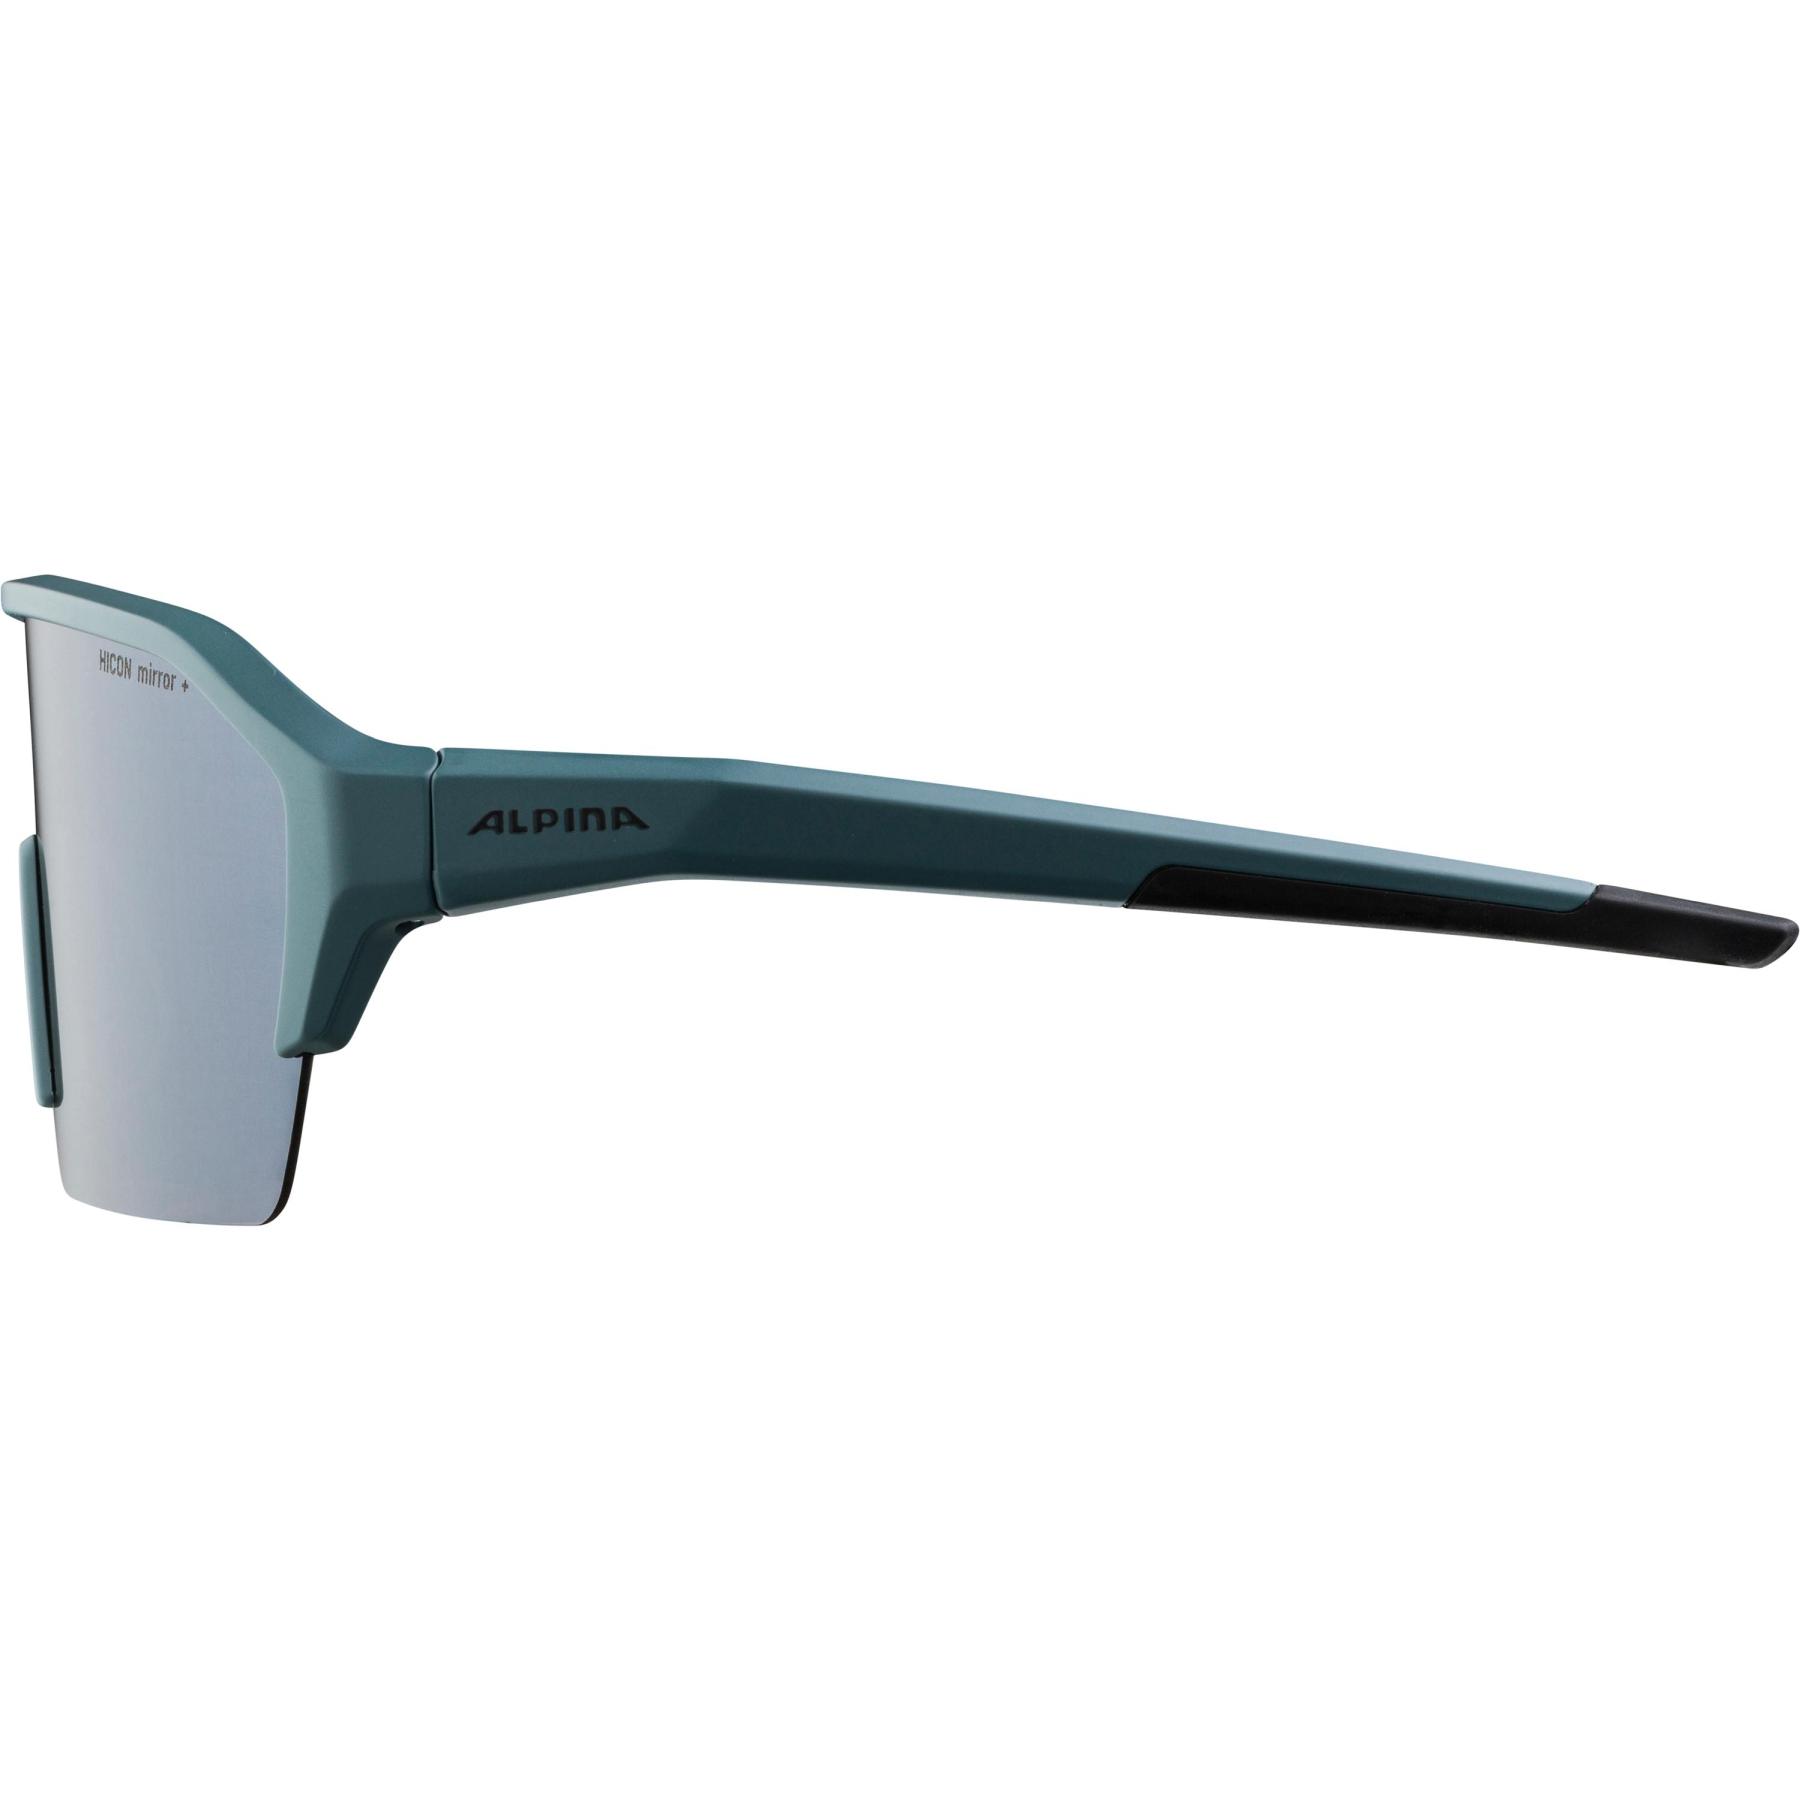 Image of Alpina Ram HR HM+ Glasses - dirtblue matt / Hicon silver mirror